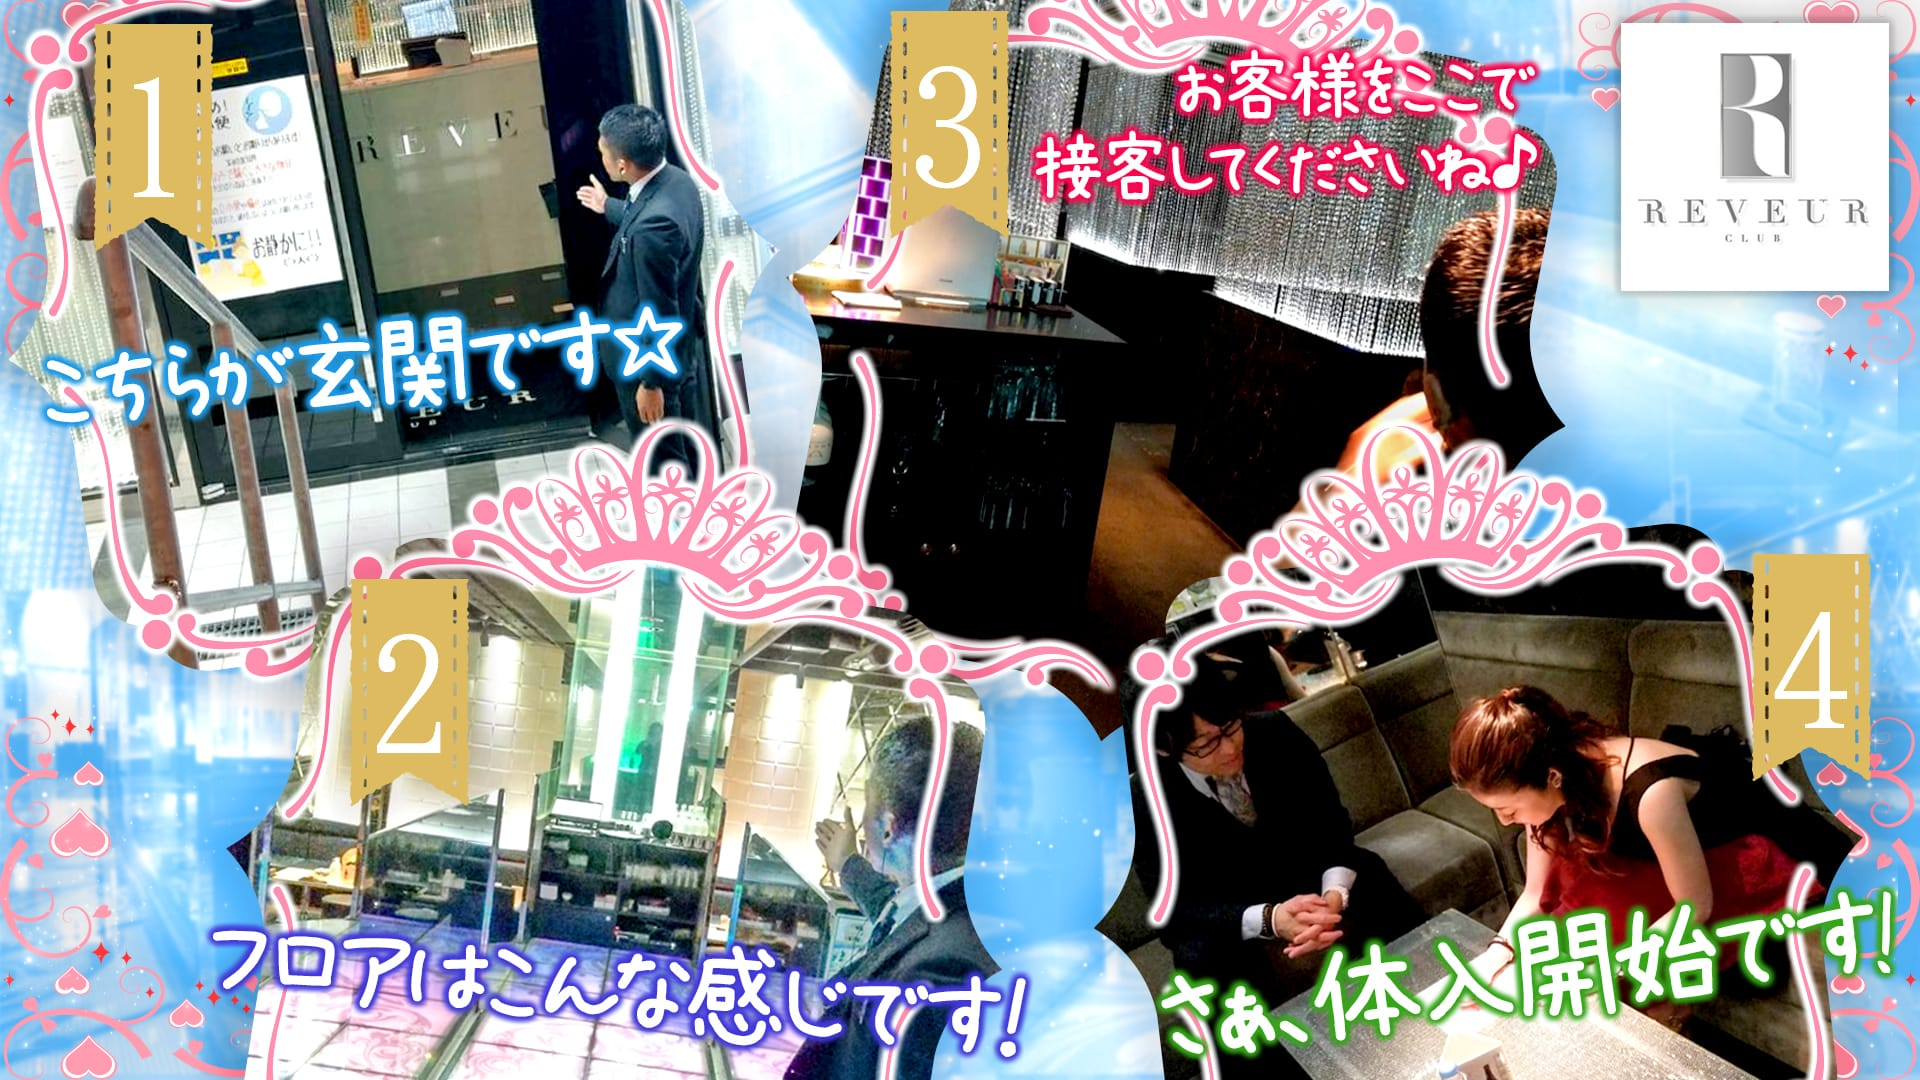 REVEUR CLUB(リヴェールクラブ) 高円寺キャバクラ TOP画像